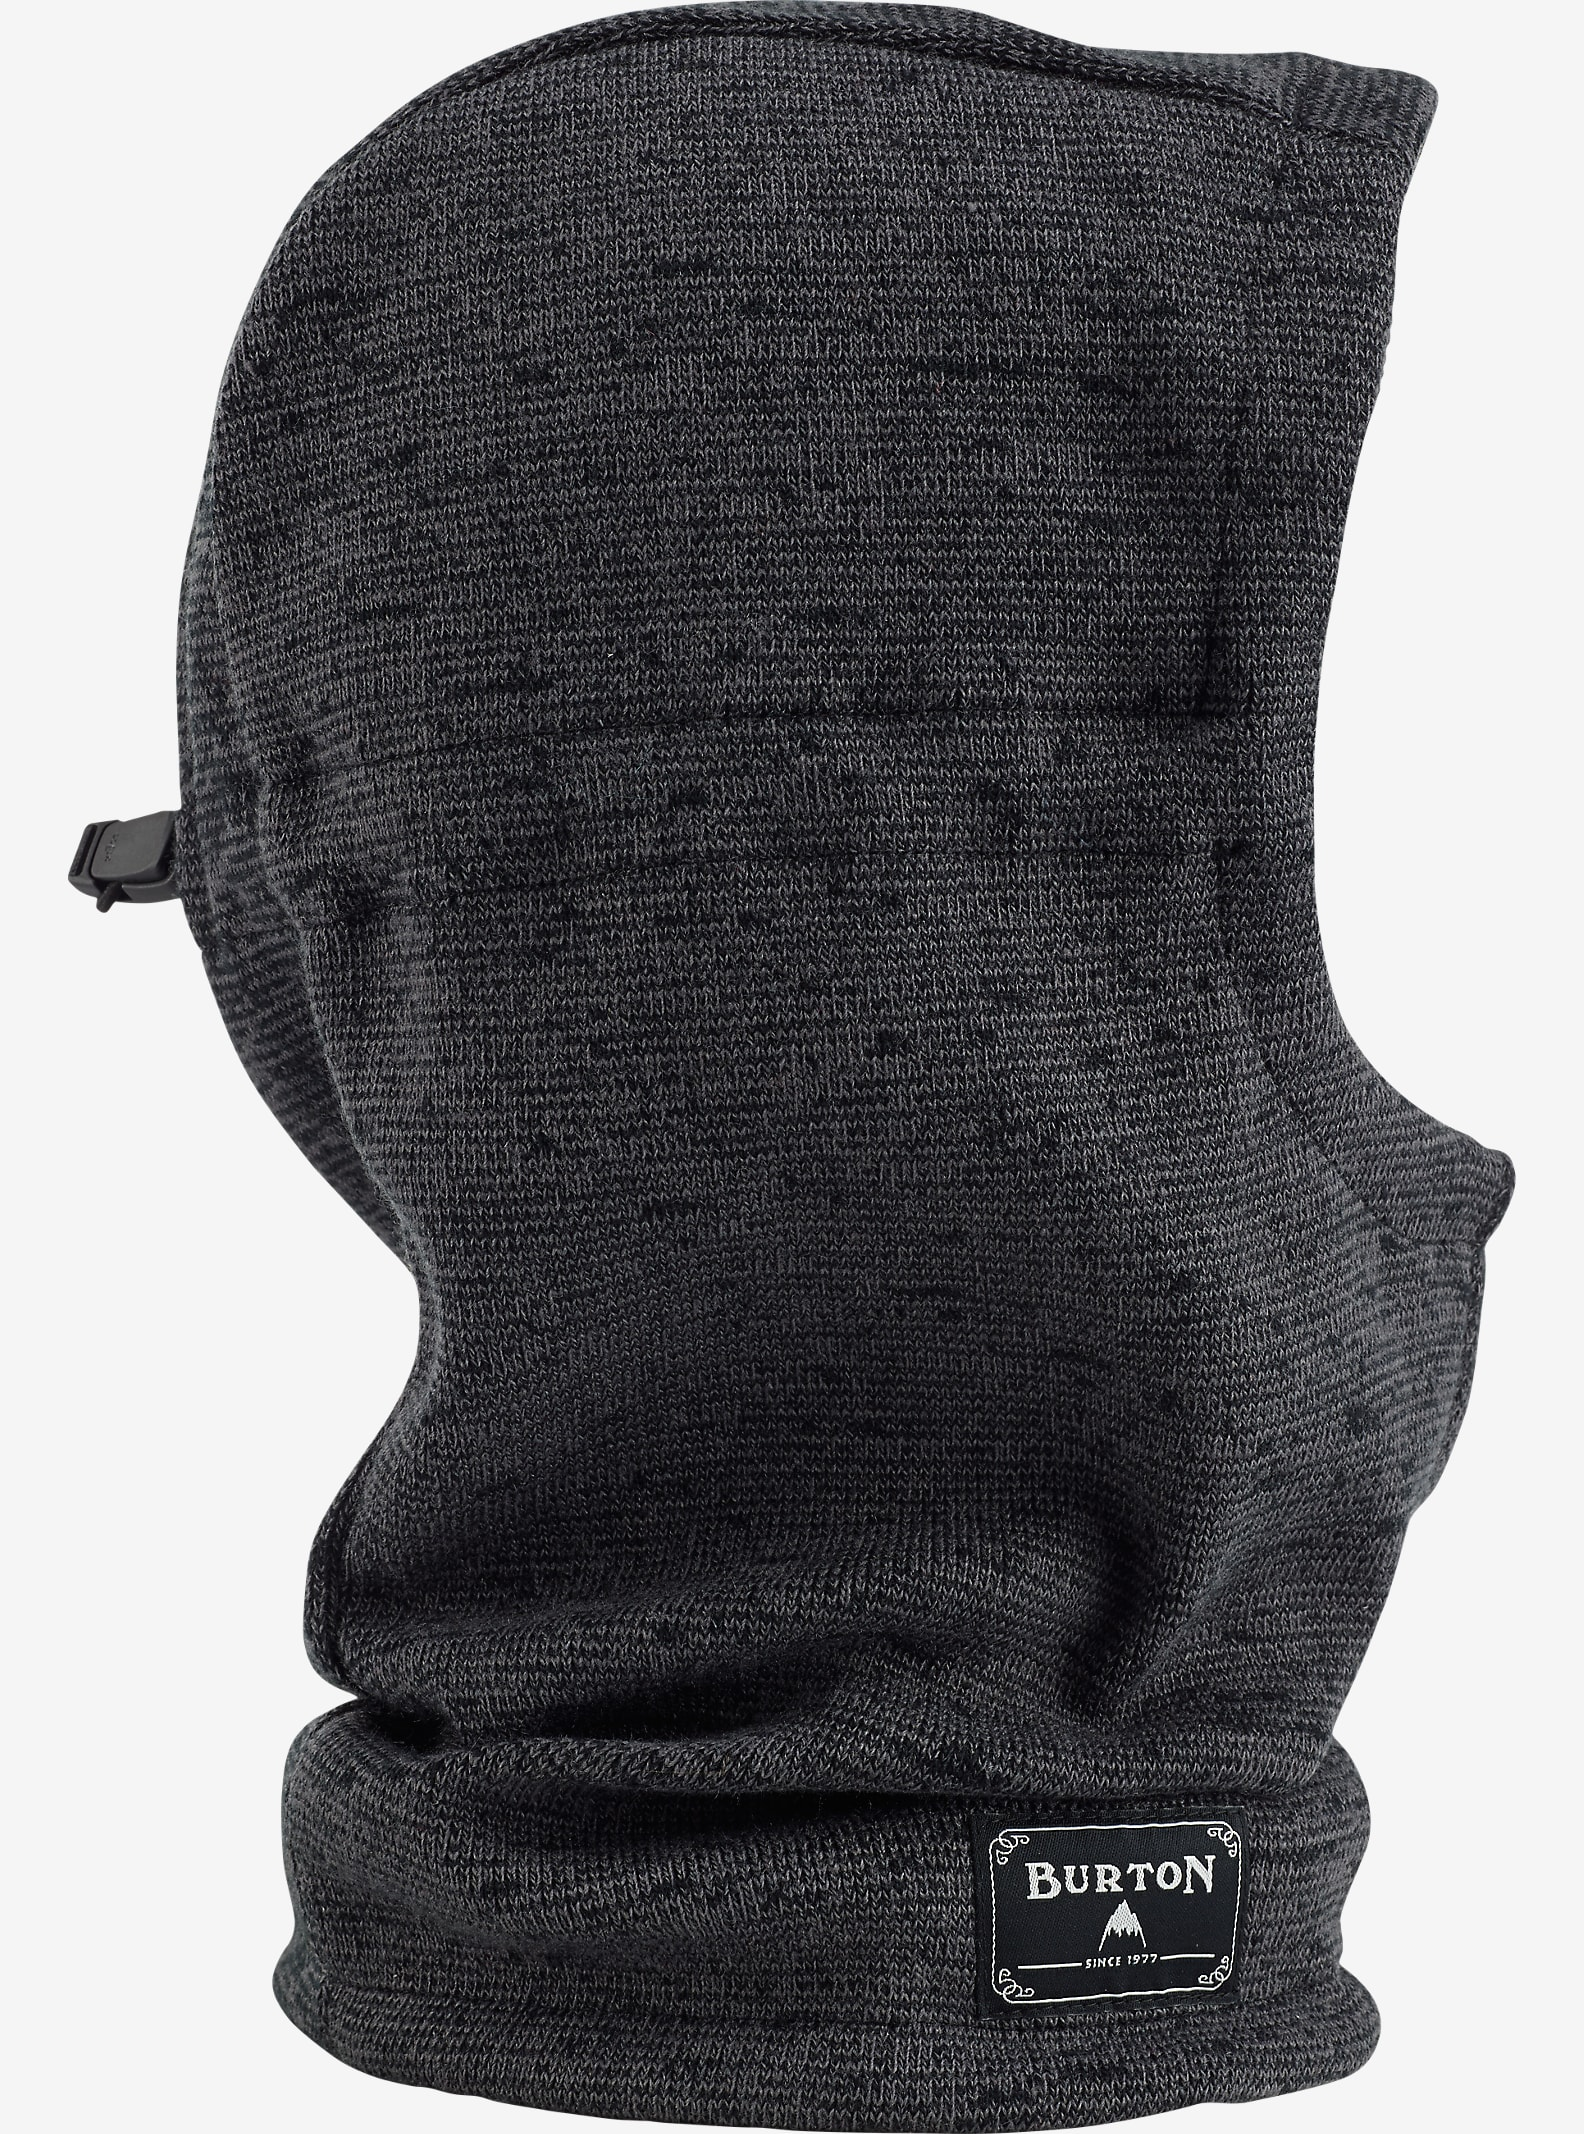 Burton Hampshire Hood shown in True Black / Faded Marl